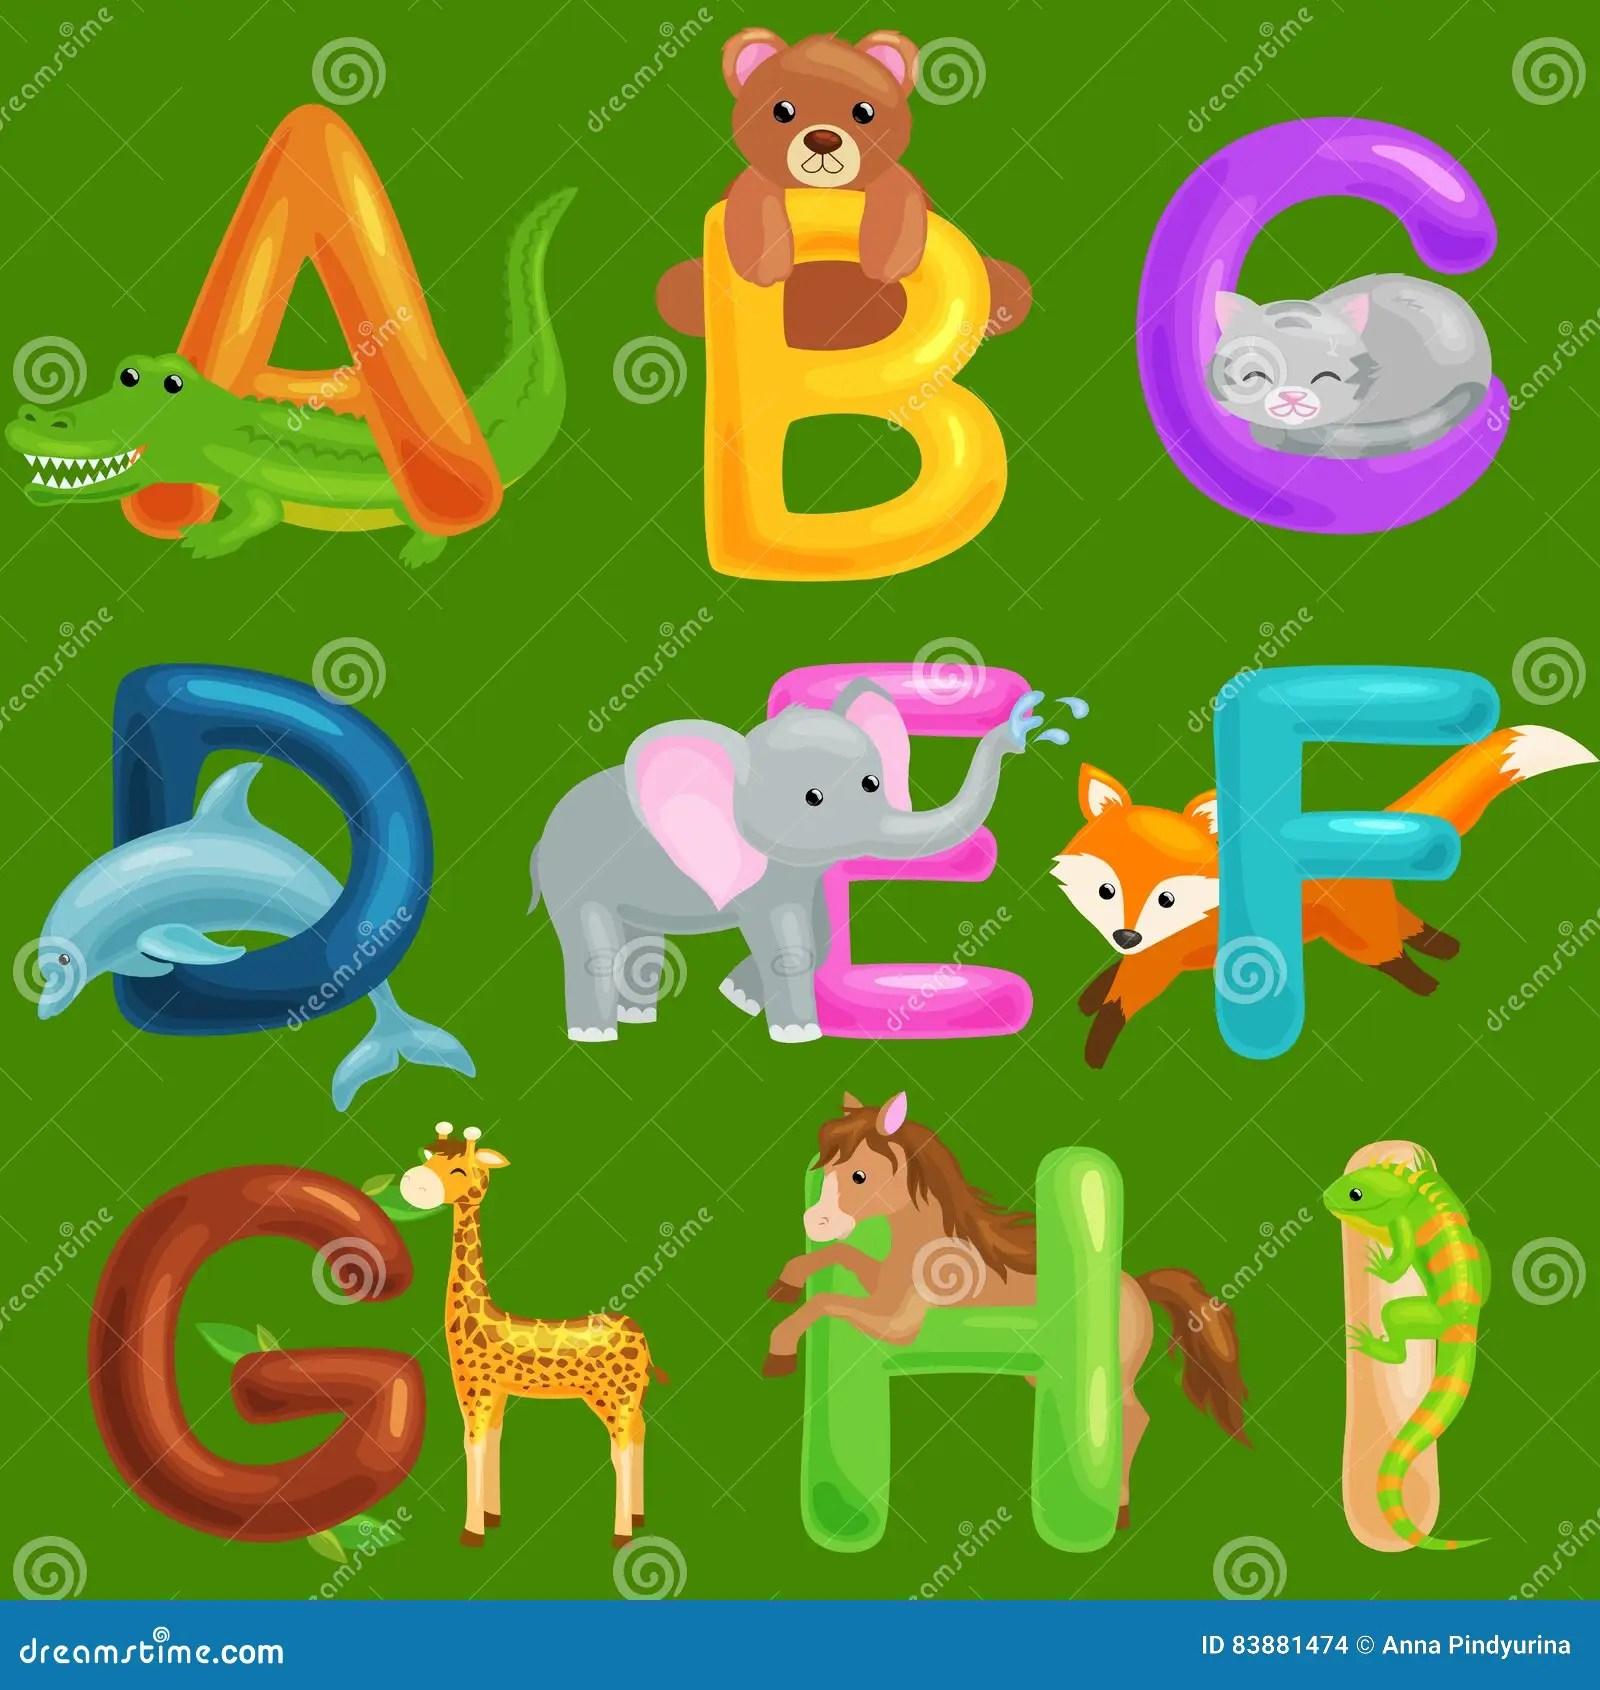 Learn Abc For Kids Kindergarten